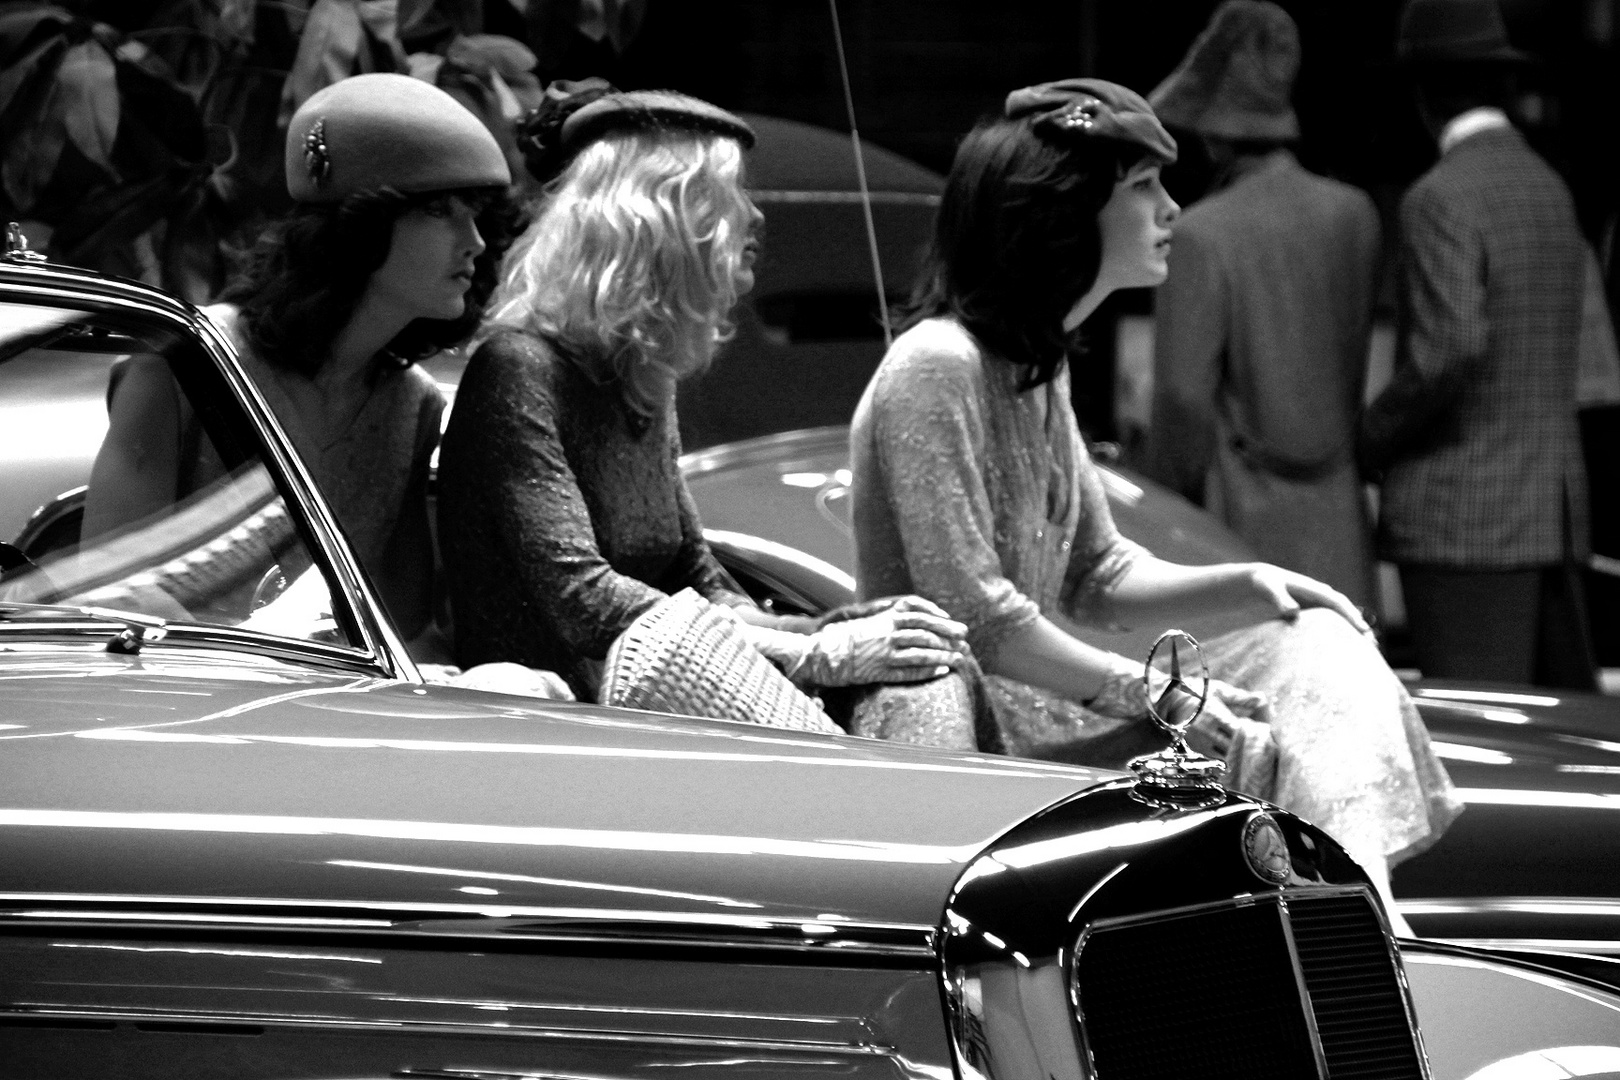 Women & Mercedes